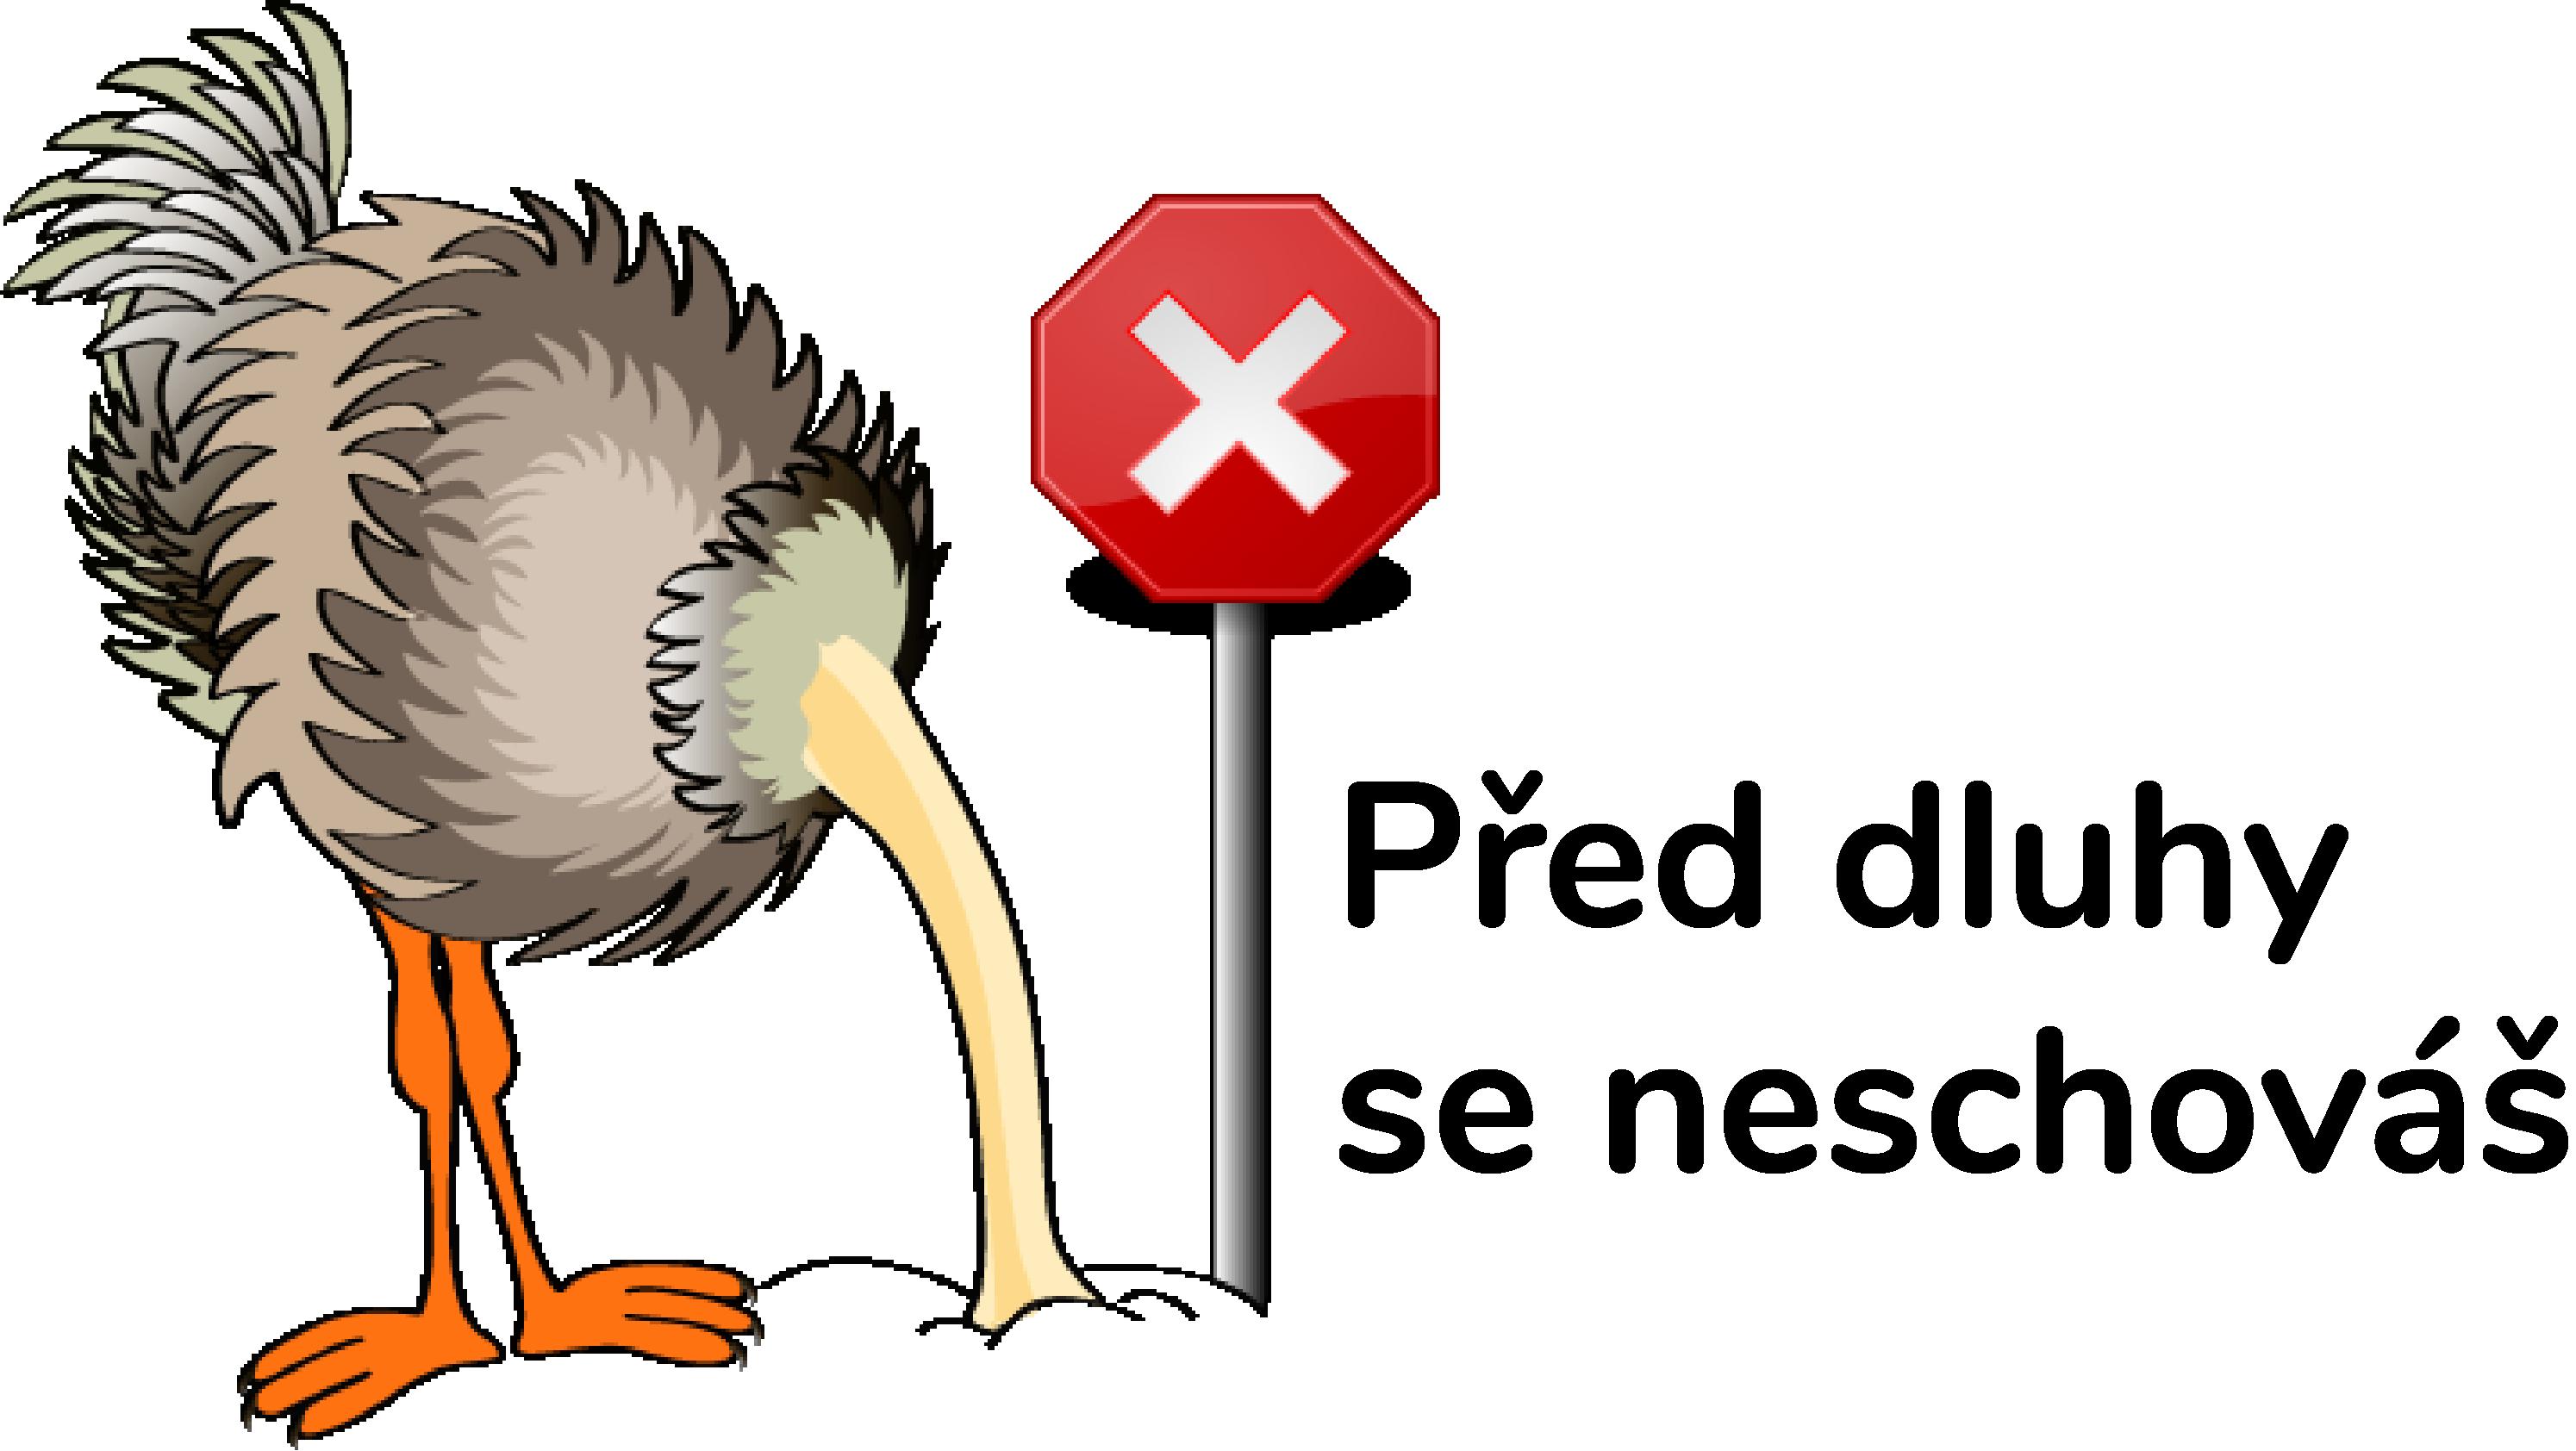 Dluhový poradce praha logo